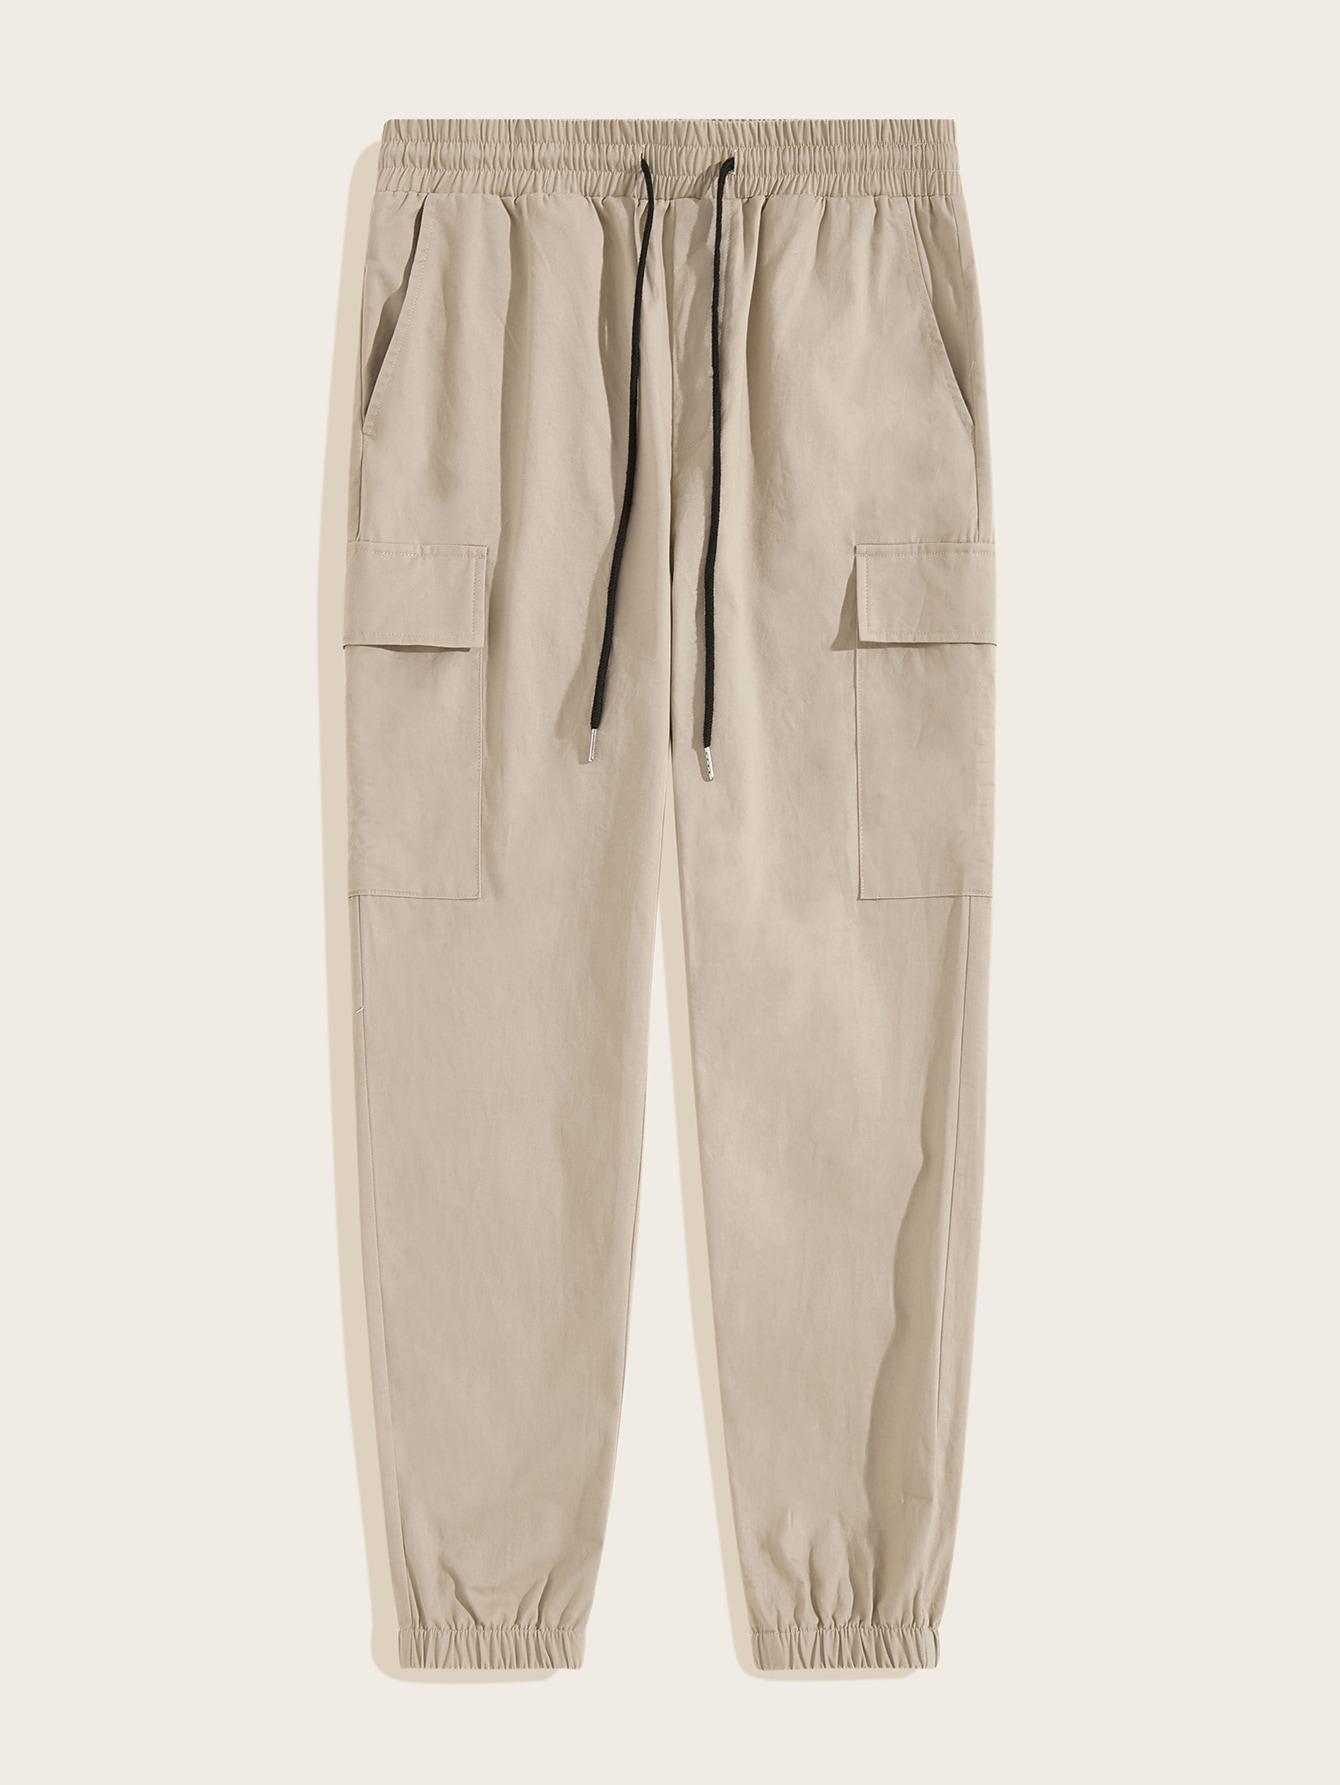 Фото - Мужские брюки с карманом и поясом от SheIn цвета хаки